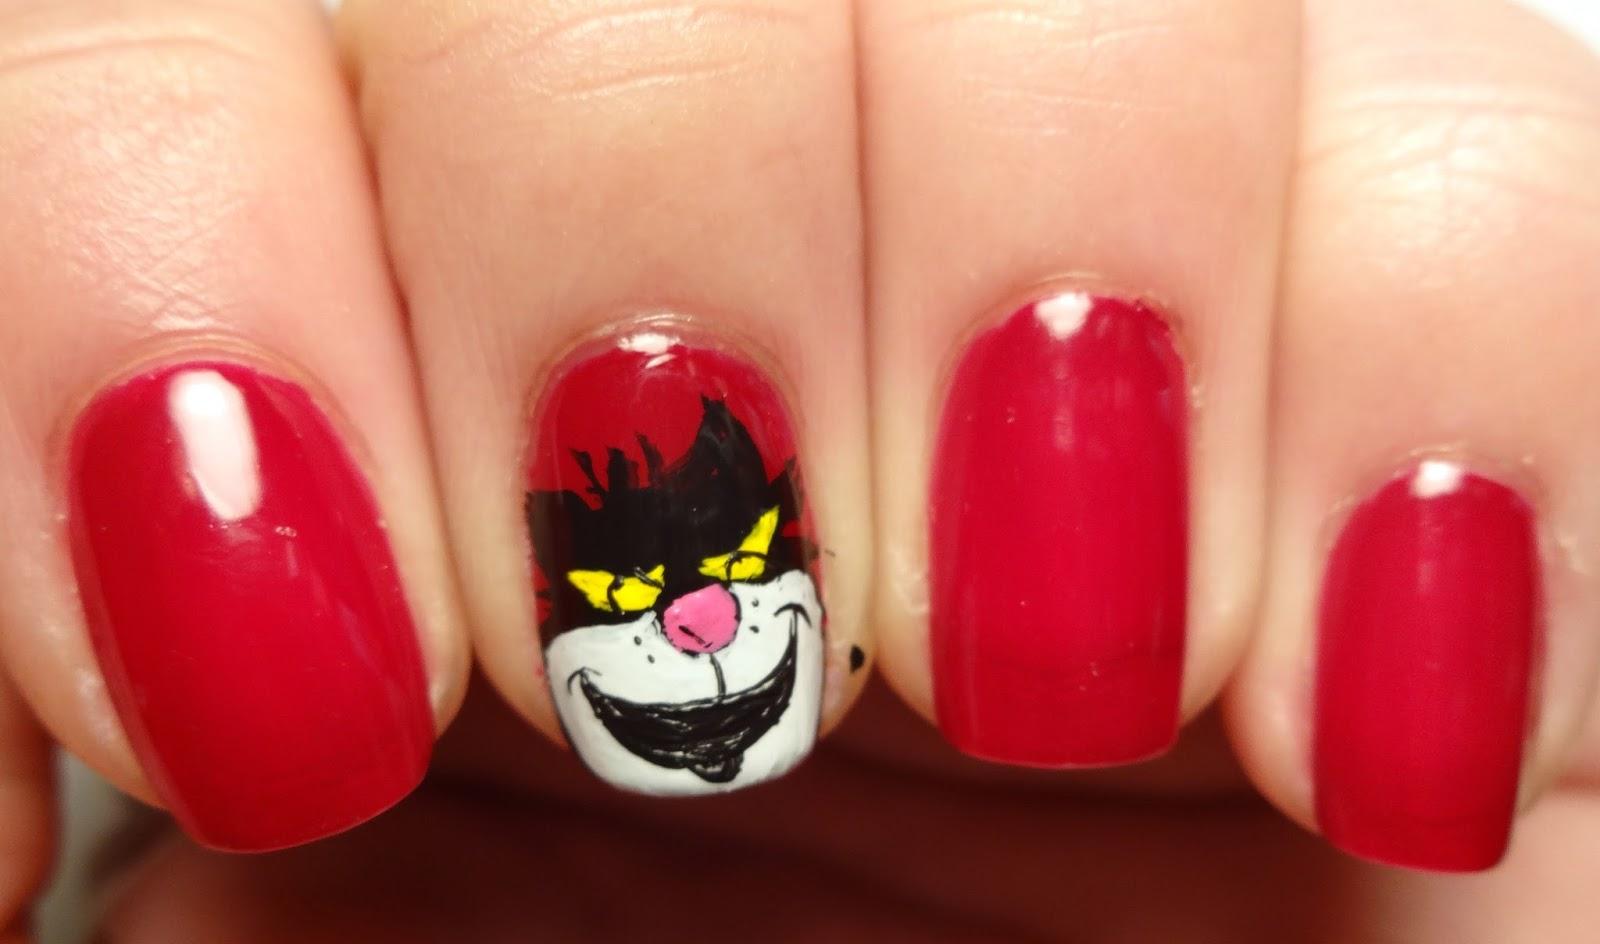 Lucifer Cinderella Nail Art